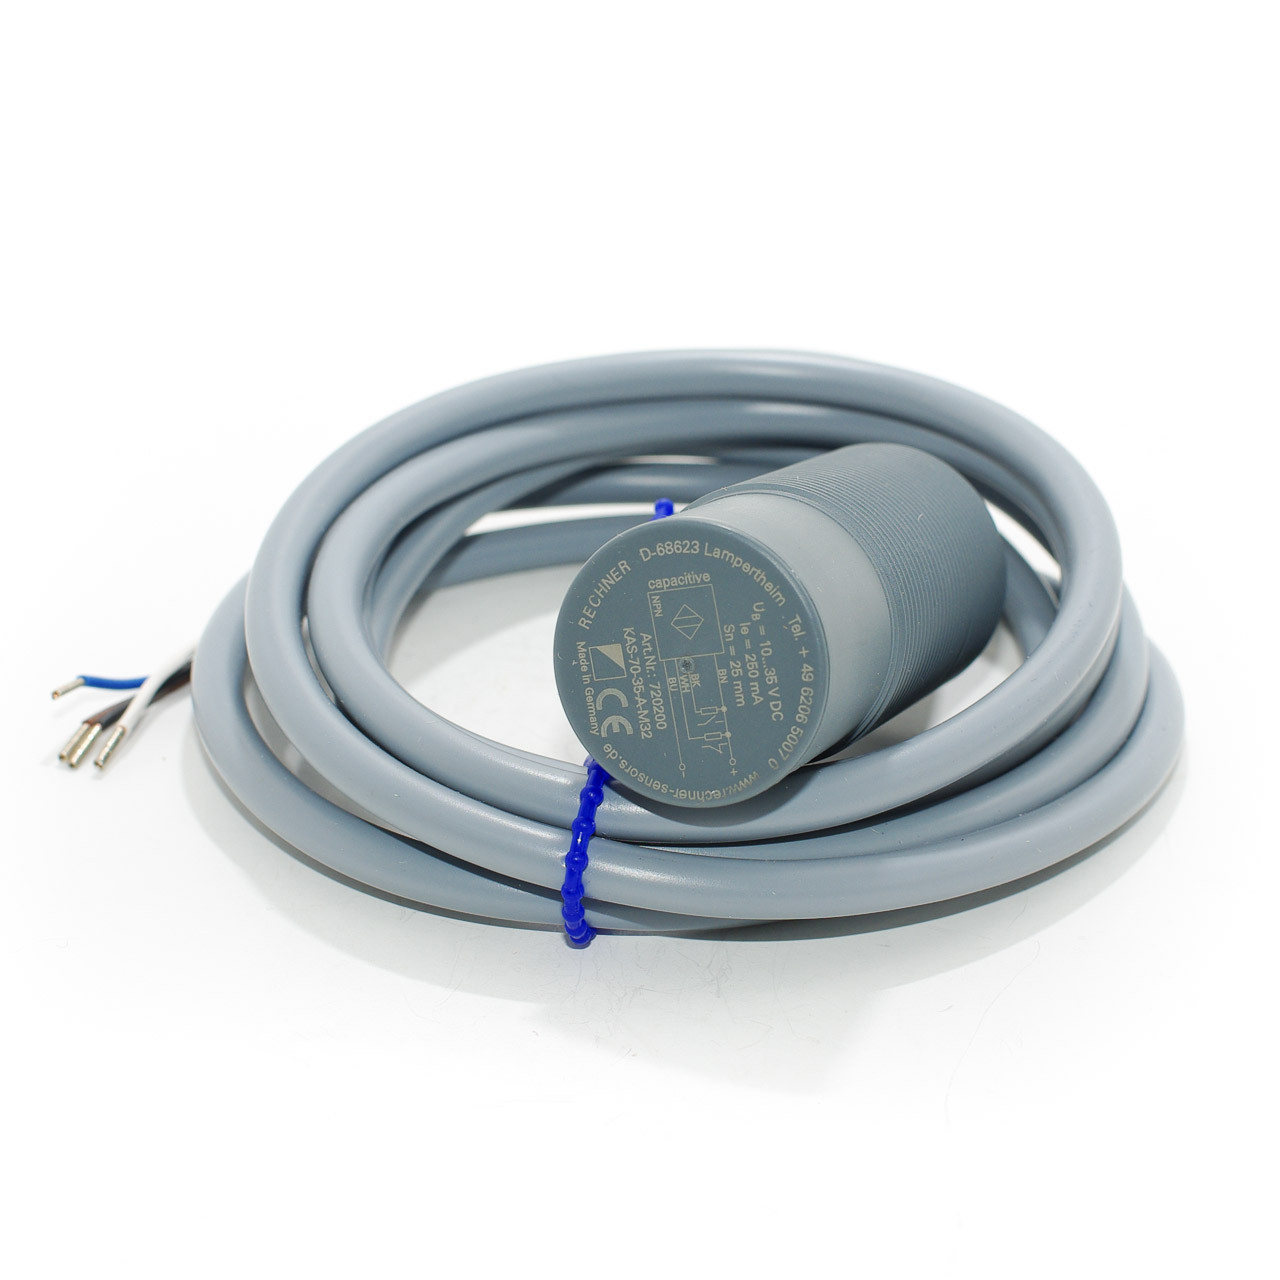 Rechner NPN Capacitive Sensor - TremTech Electrical Systems Inc